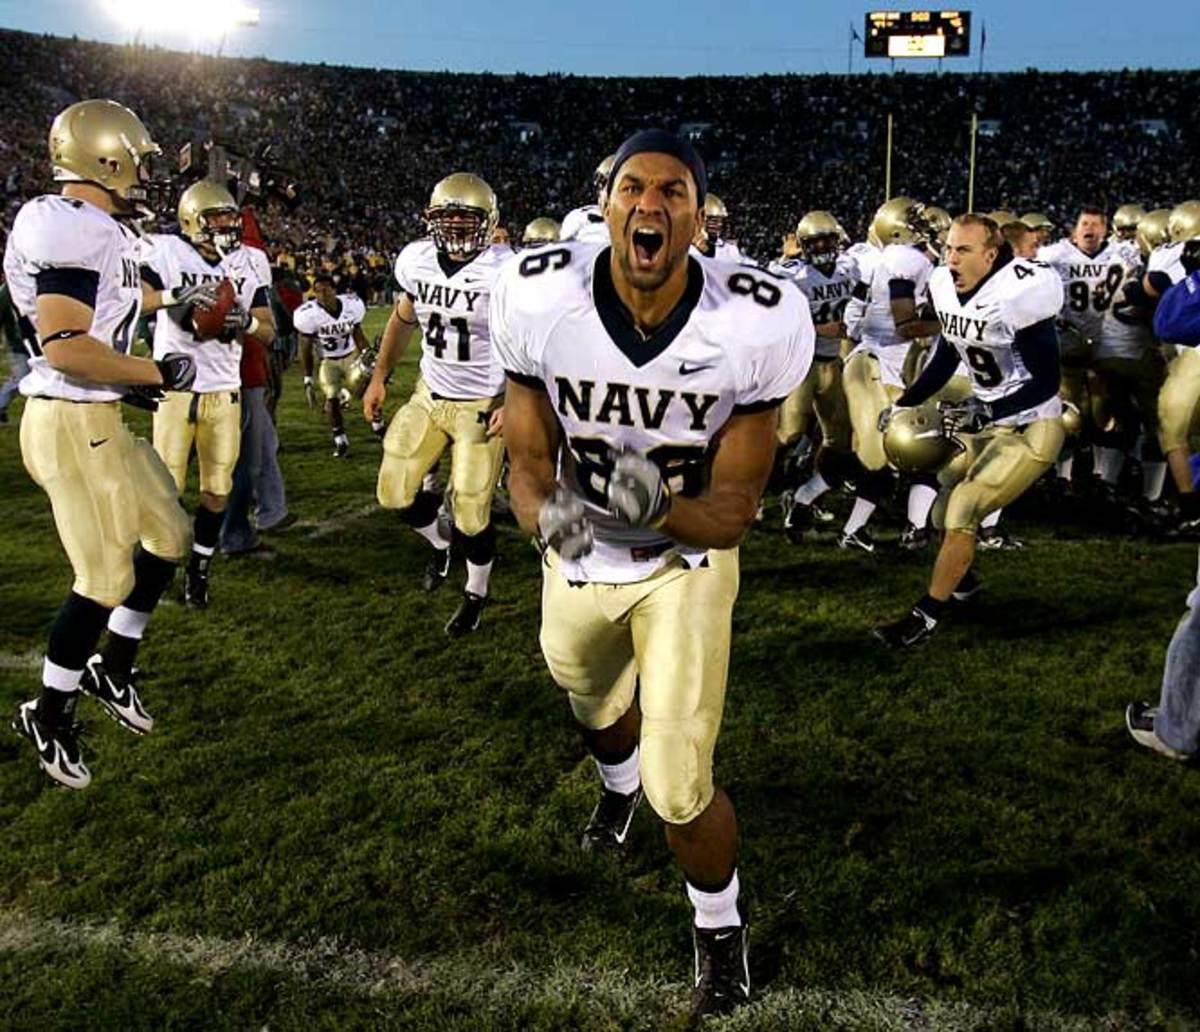 Navy 46, Notre Dame 44